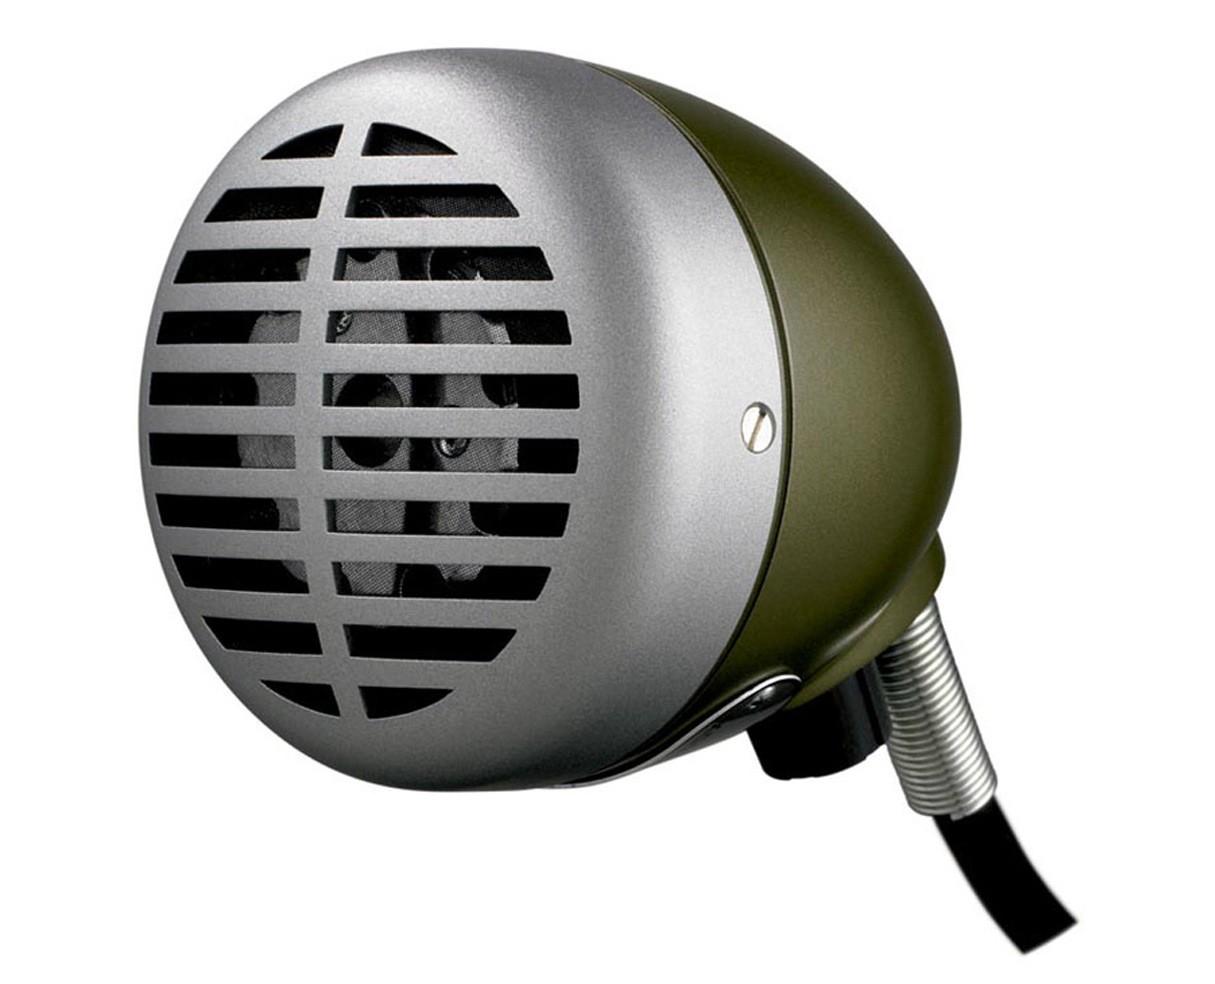 520DX - Front Side